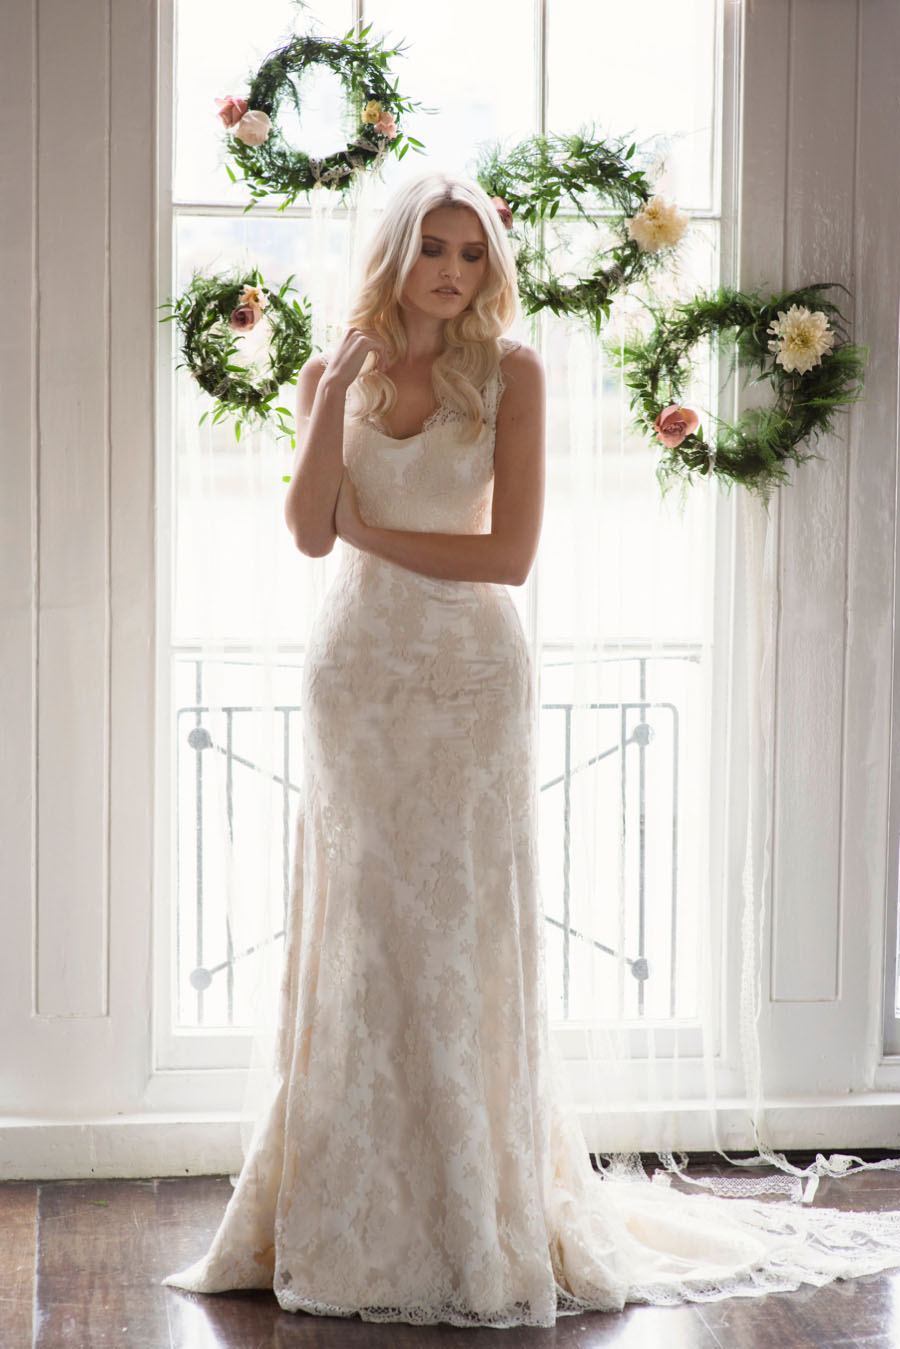 Modern Romance: Beautiful Bridal Inspiration for Modern, Romantic ...